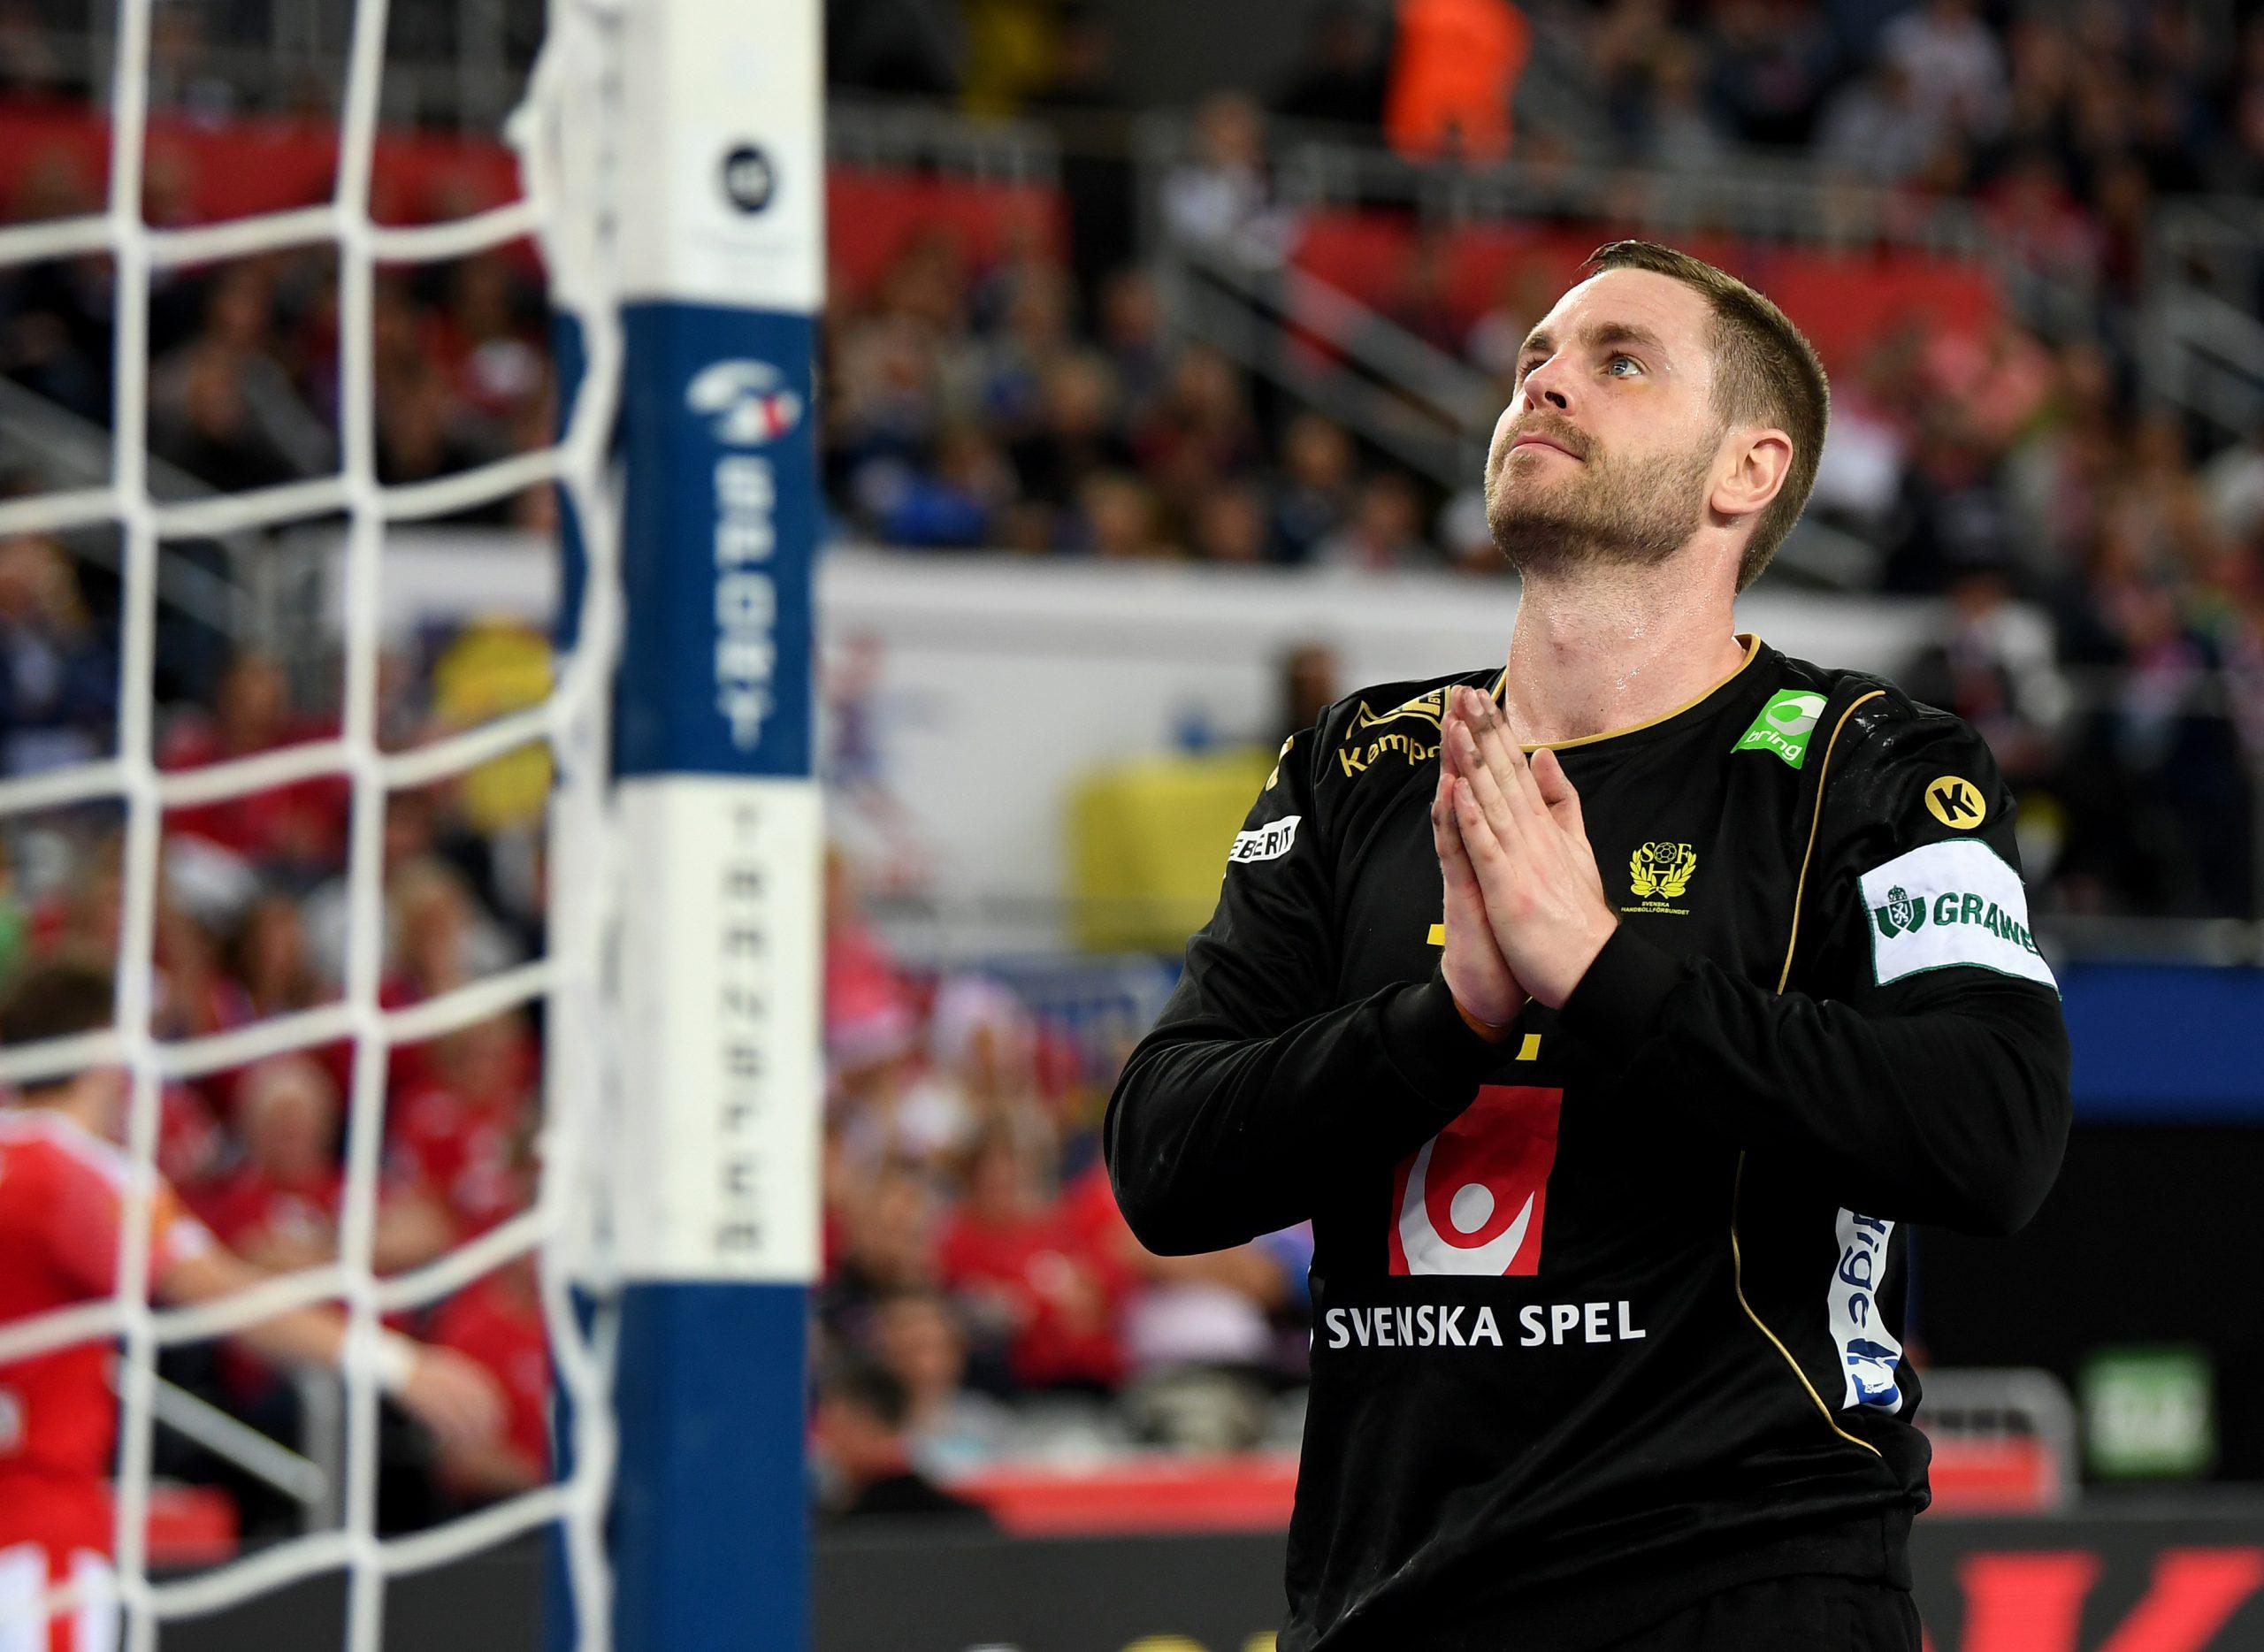 Streama Sverige – Frankrike: Live stream (Handboll VM)